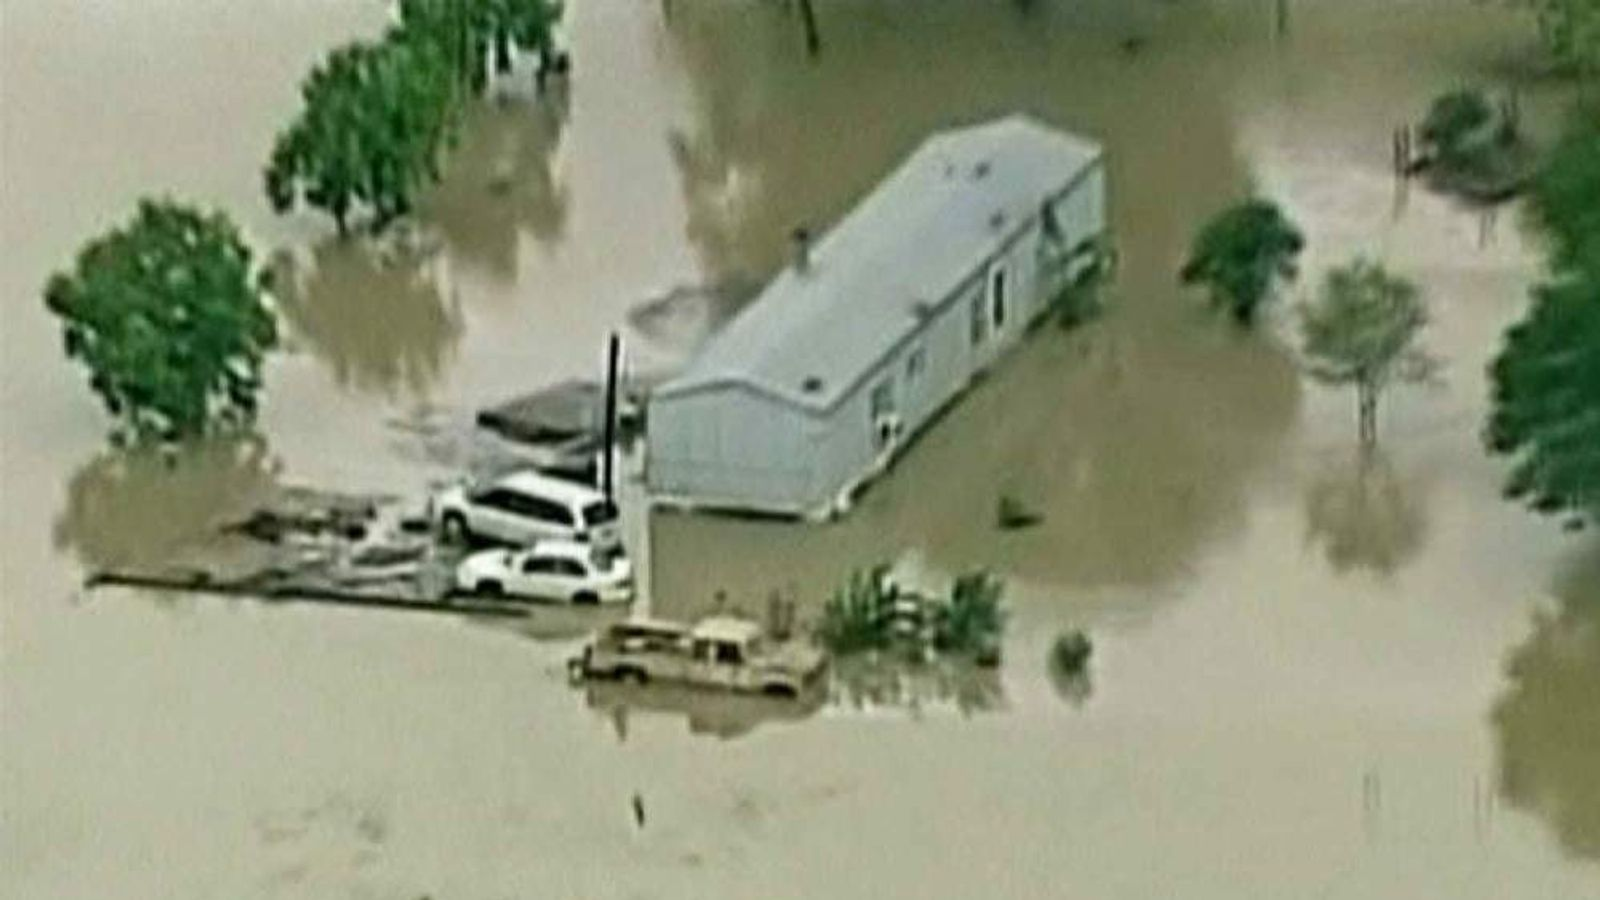 San Antonio, Texas flooding